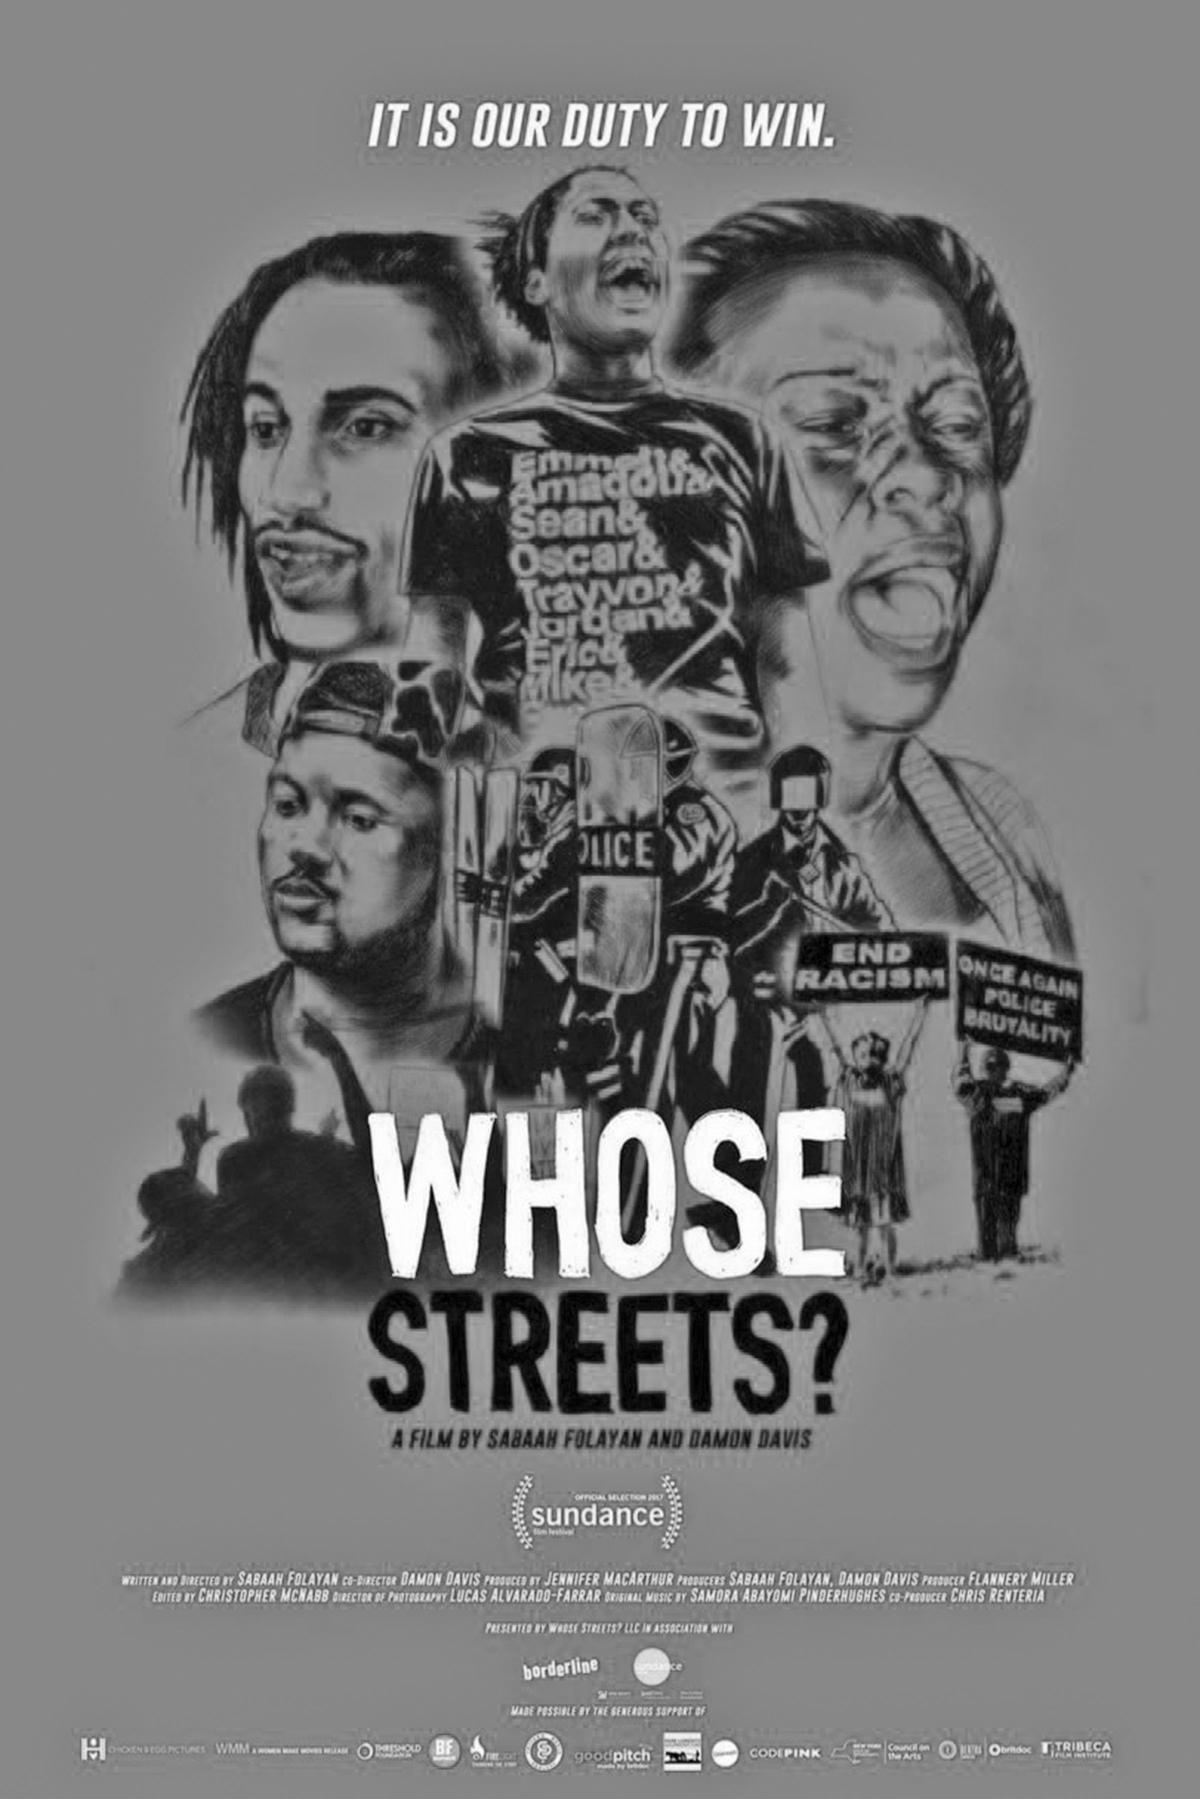 BlackStar Film Festival highlights cinema of resistance